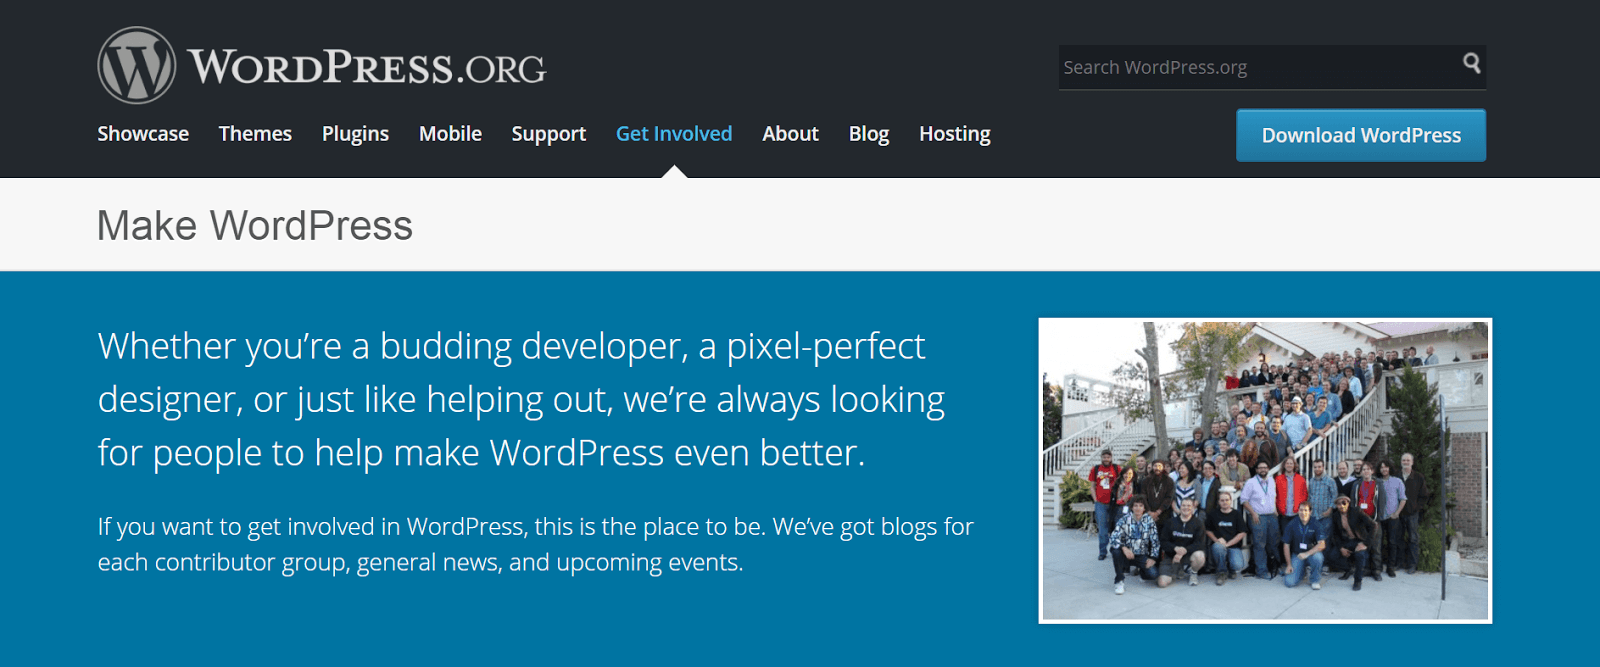 make-wordpress-homepage.PNG